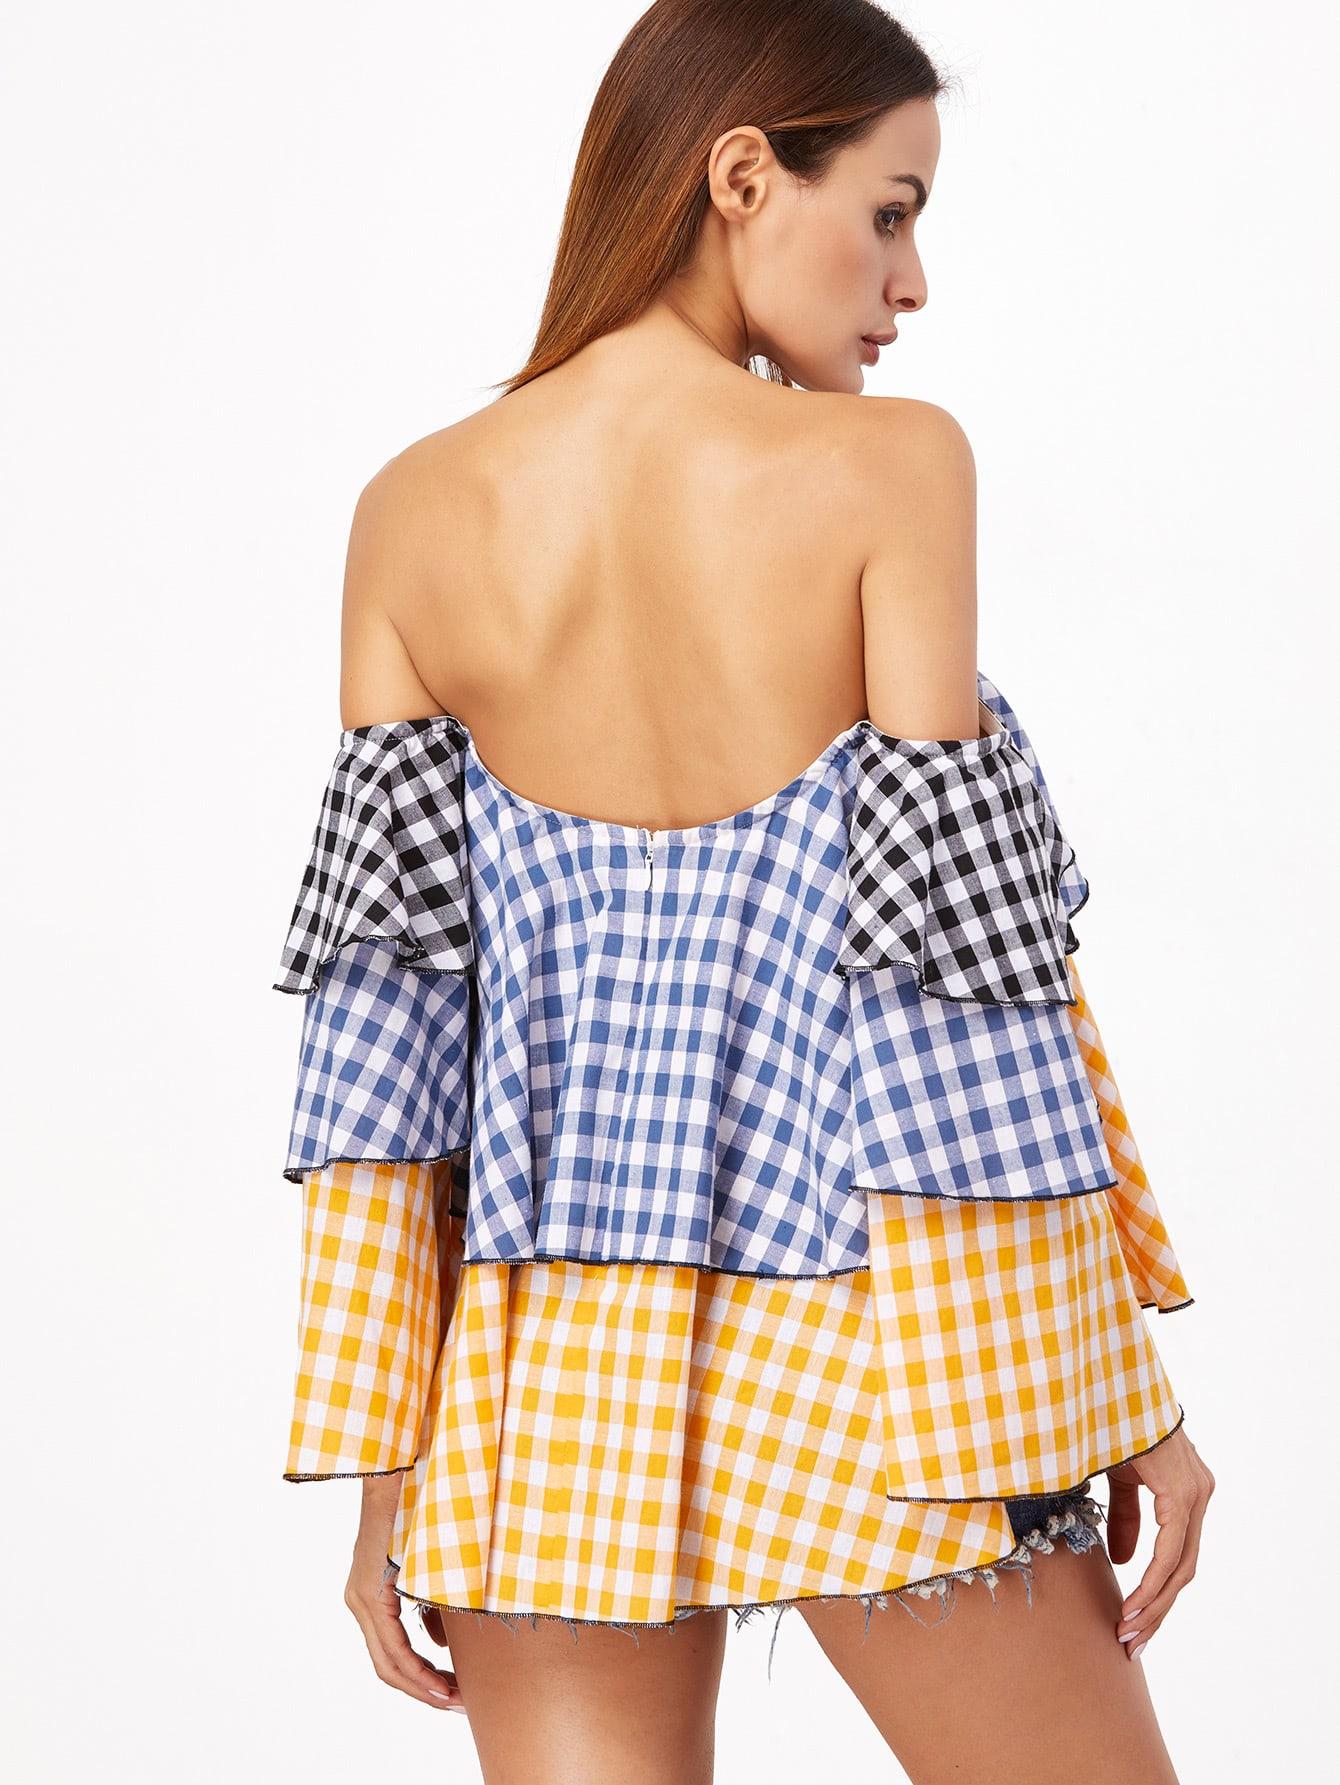 blouse161118714_2